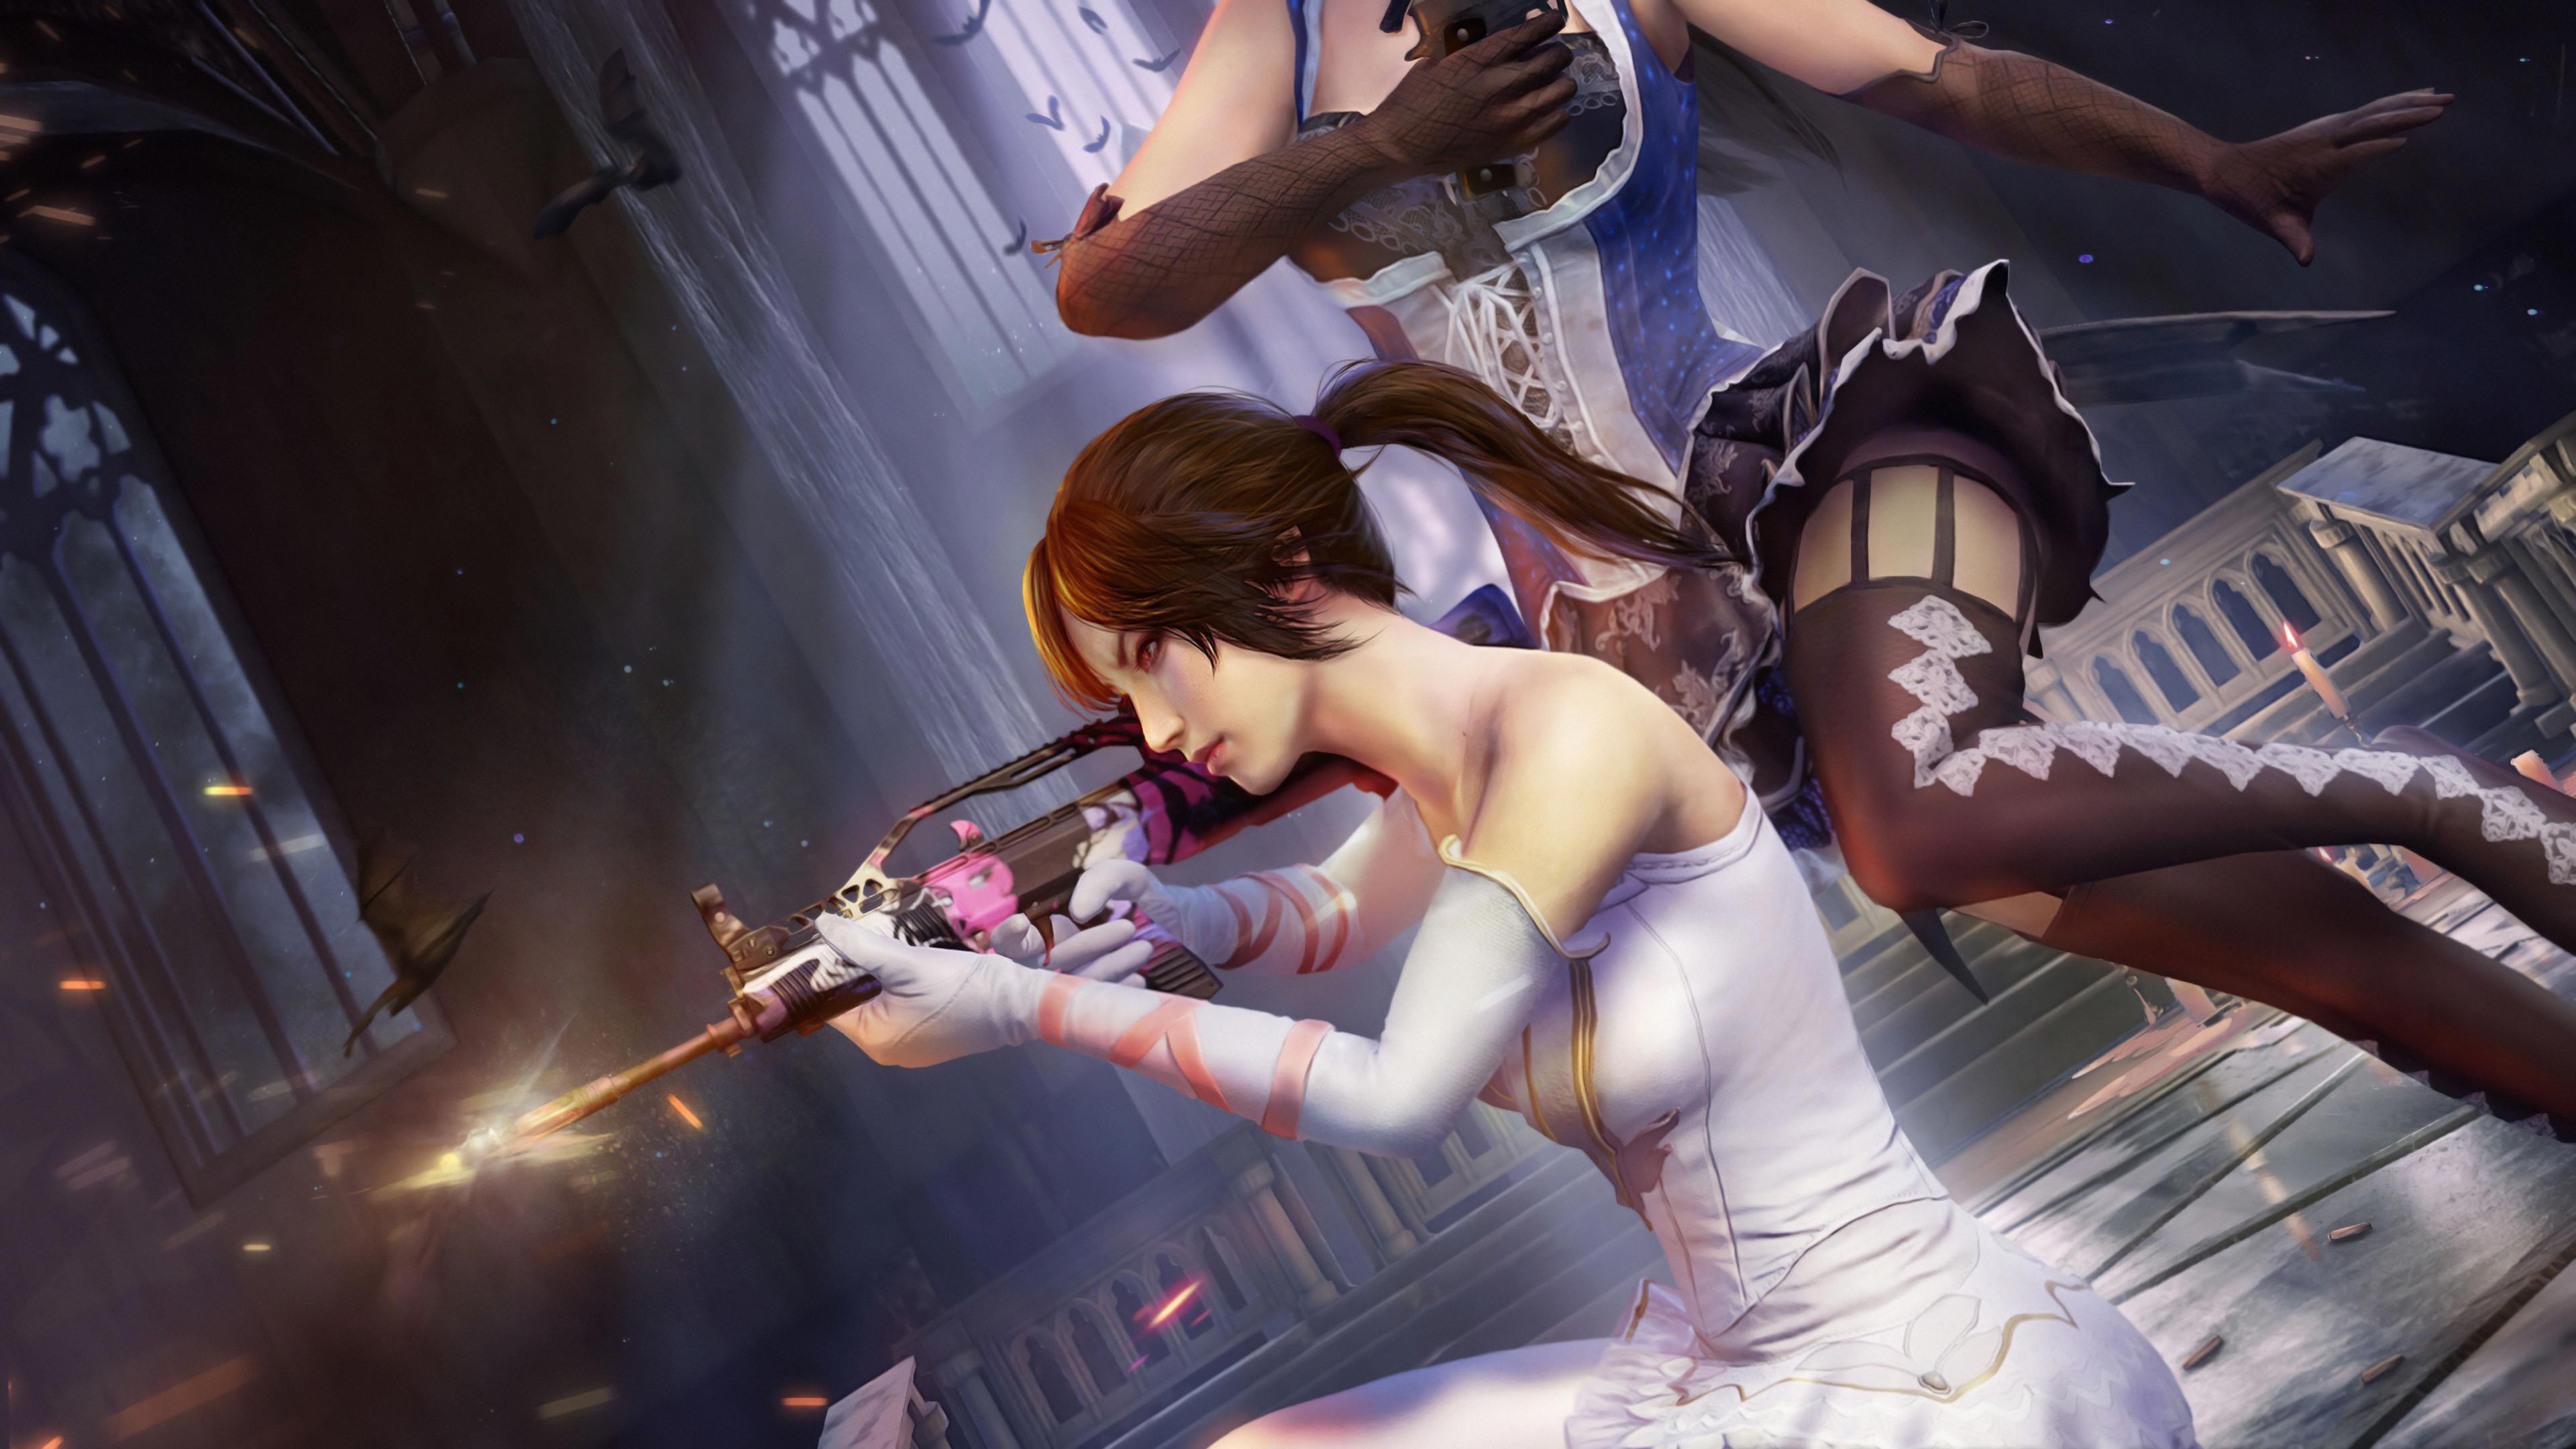 pubg fairy and enchanter 4k 9d 3840x2160 1 - Pubg Enchanter and Fairy - Pubg Enchanter and Fairy 4k wallapper